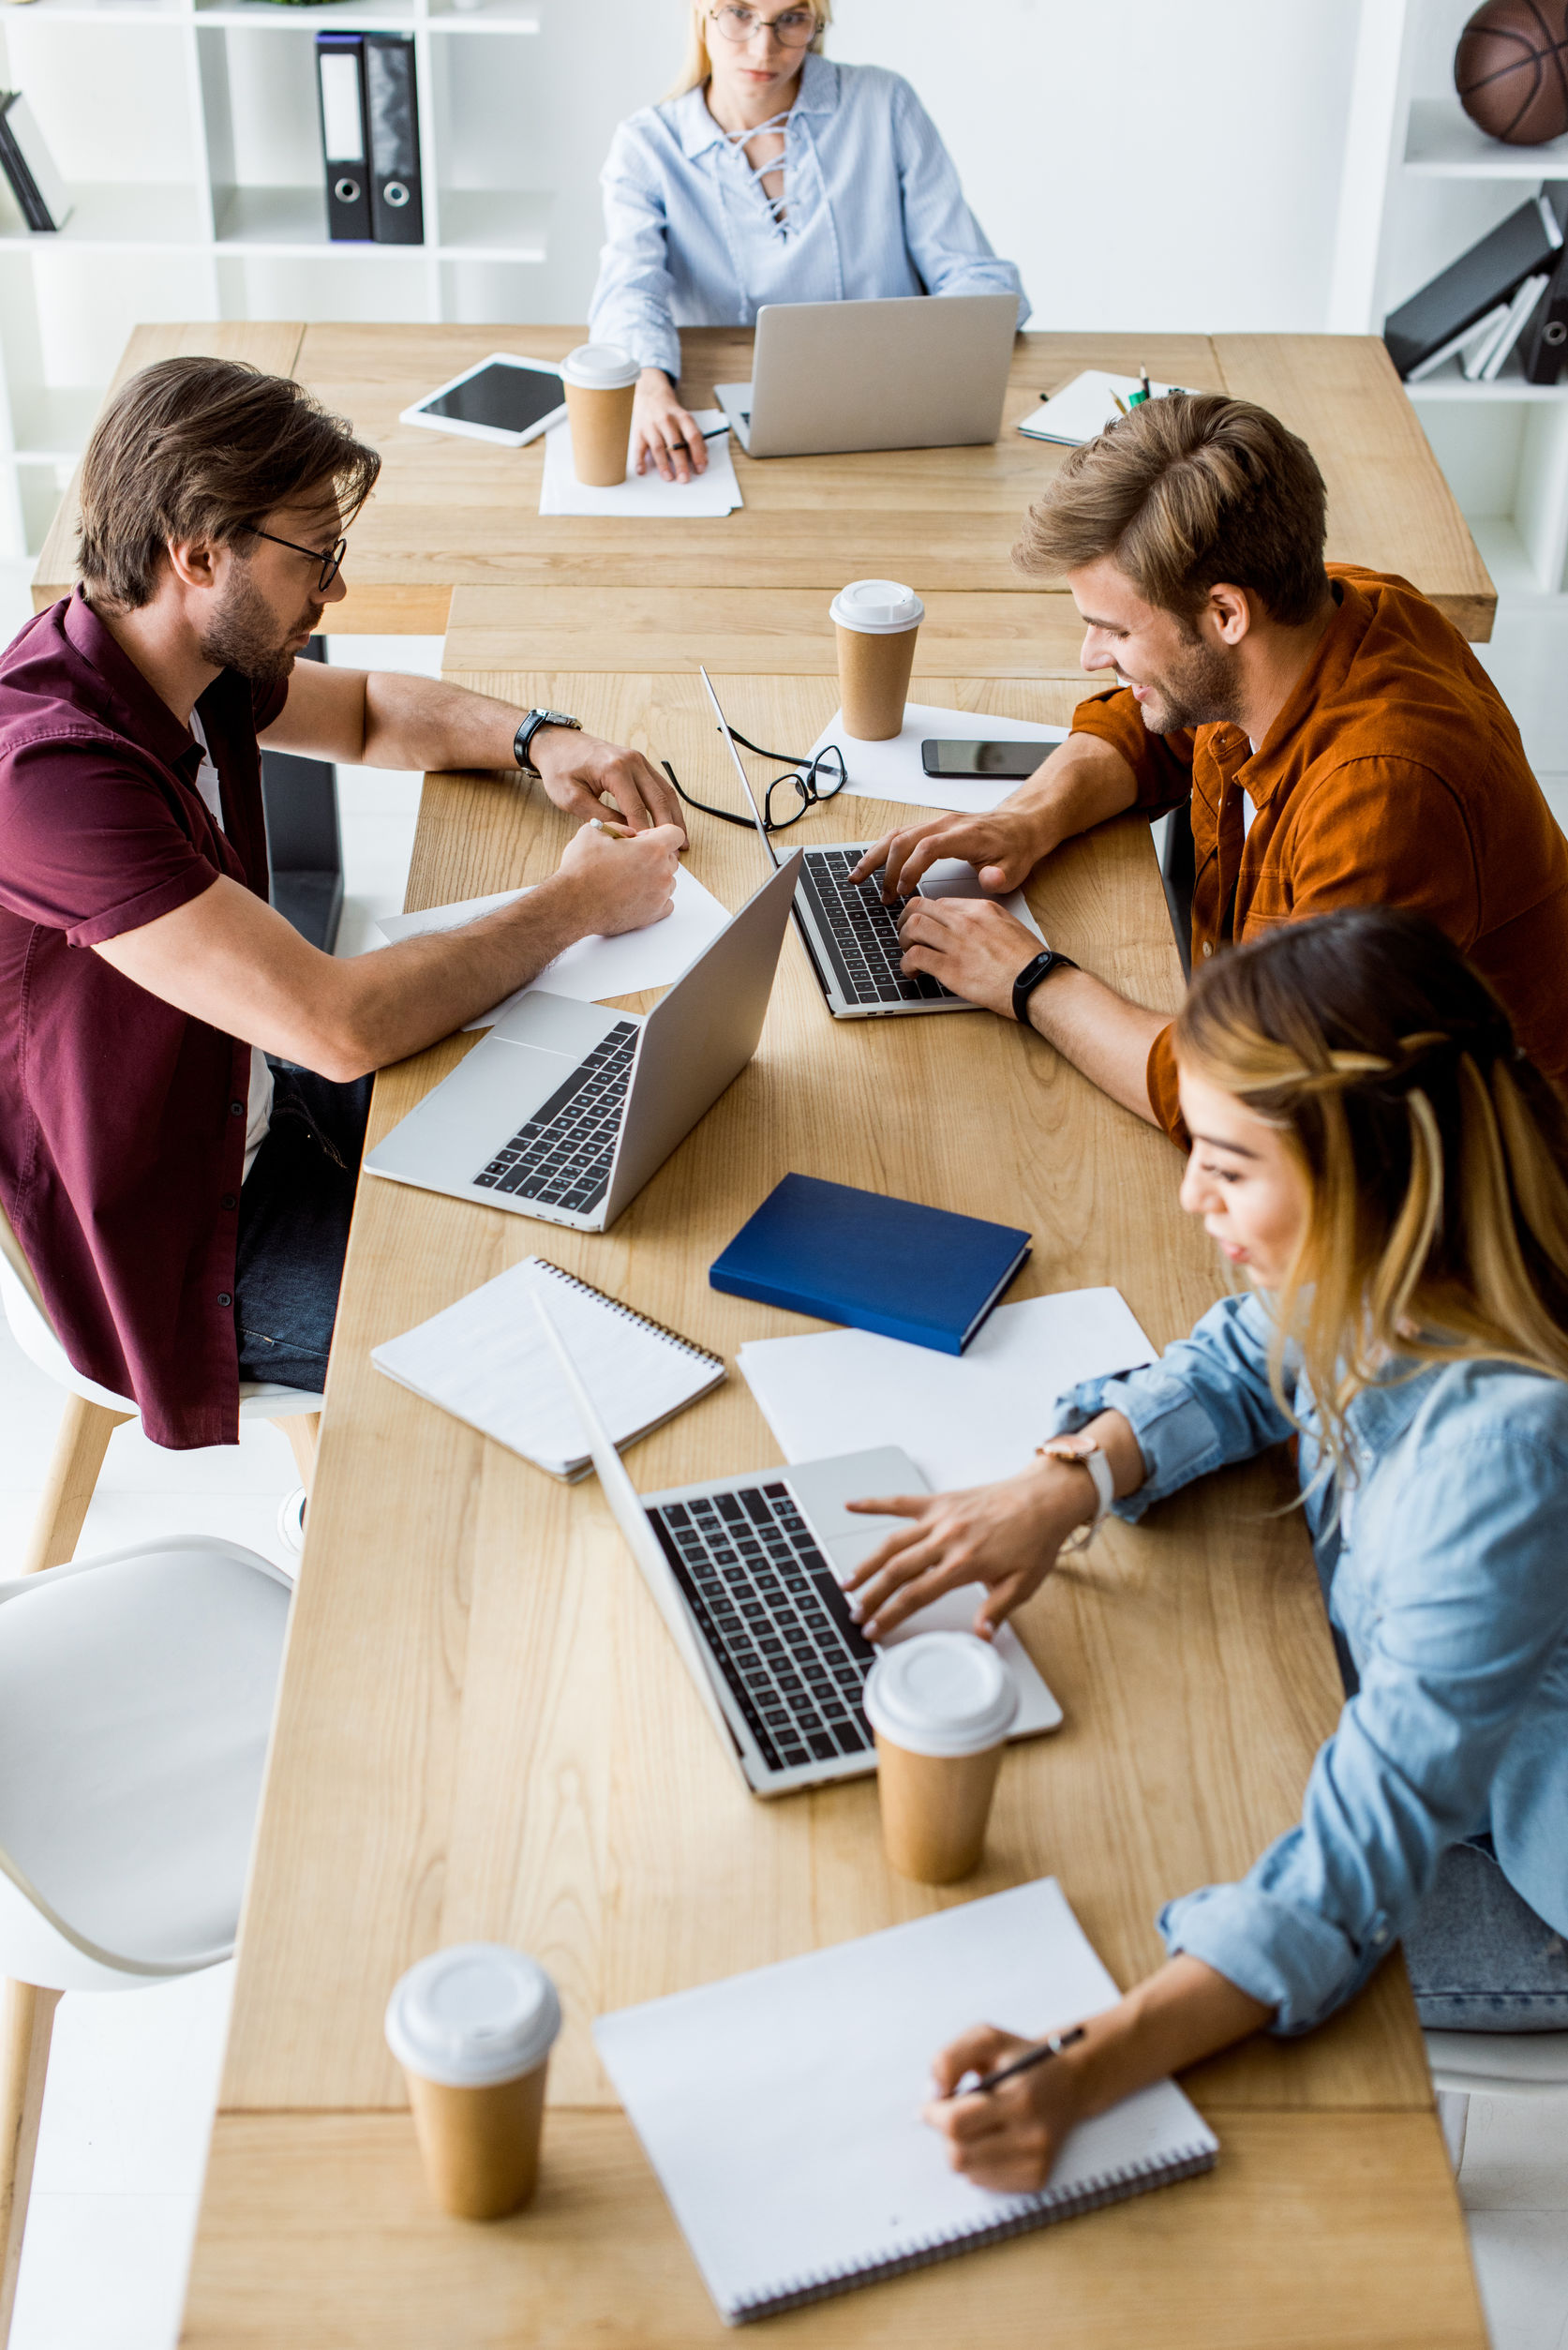 Agence de prestation Digitale pour votre communication digitale. Ulysse Digital agence digitale vous accompagne dans vos campagne emailing marketing